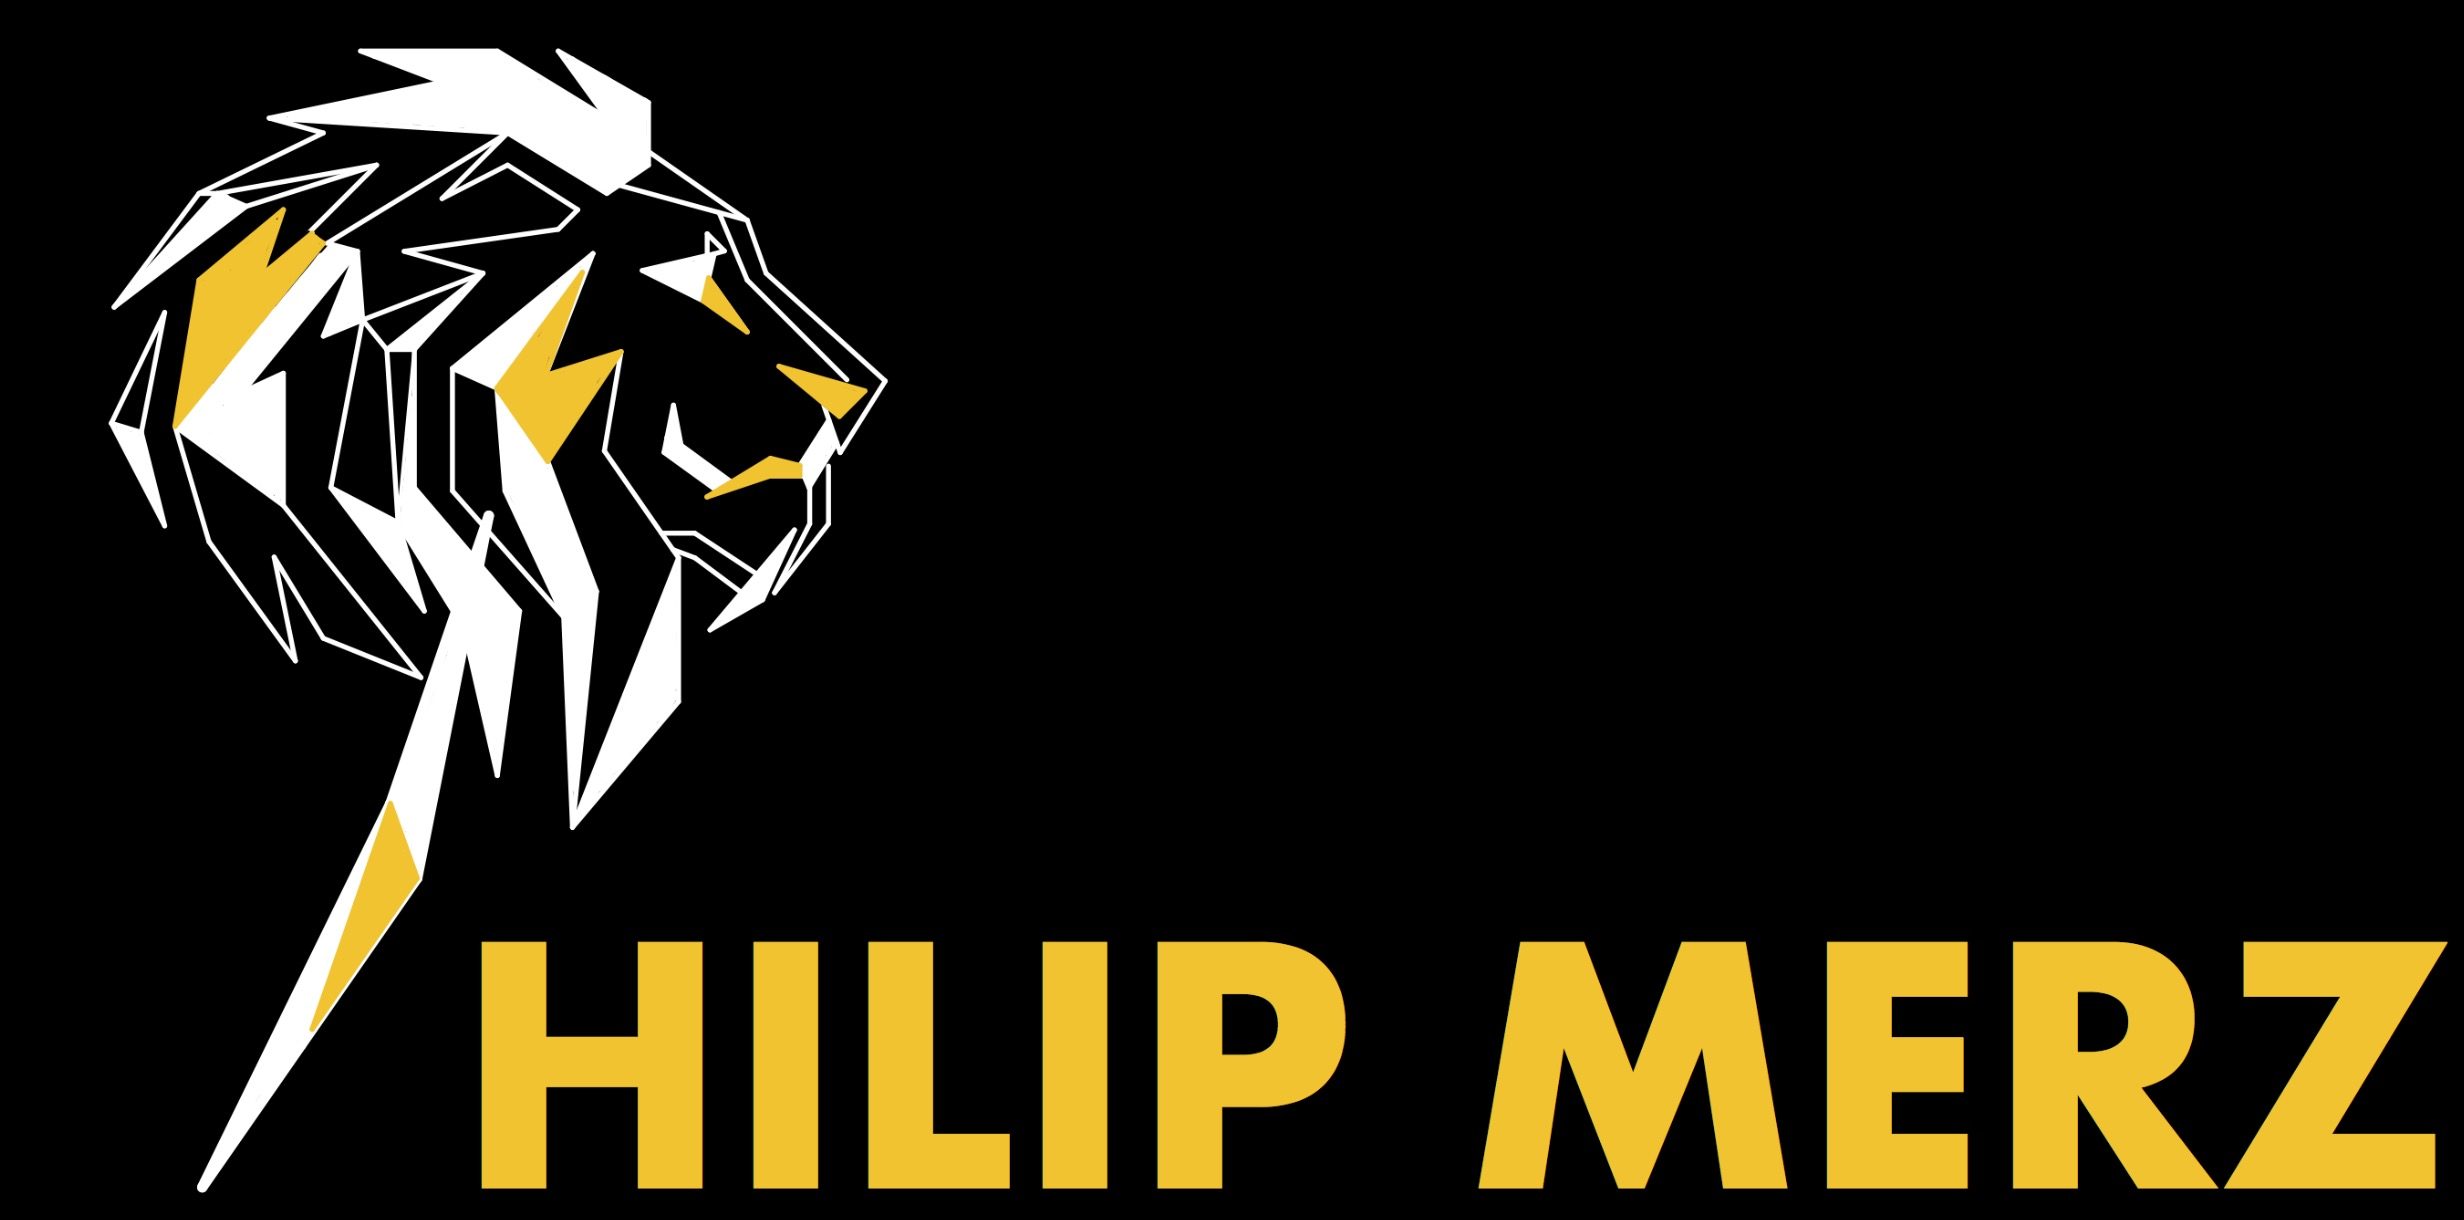 PhilipMerz